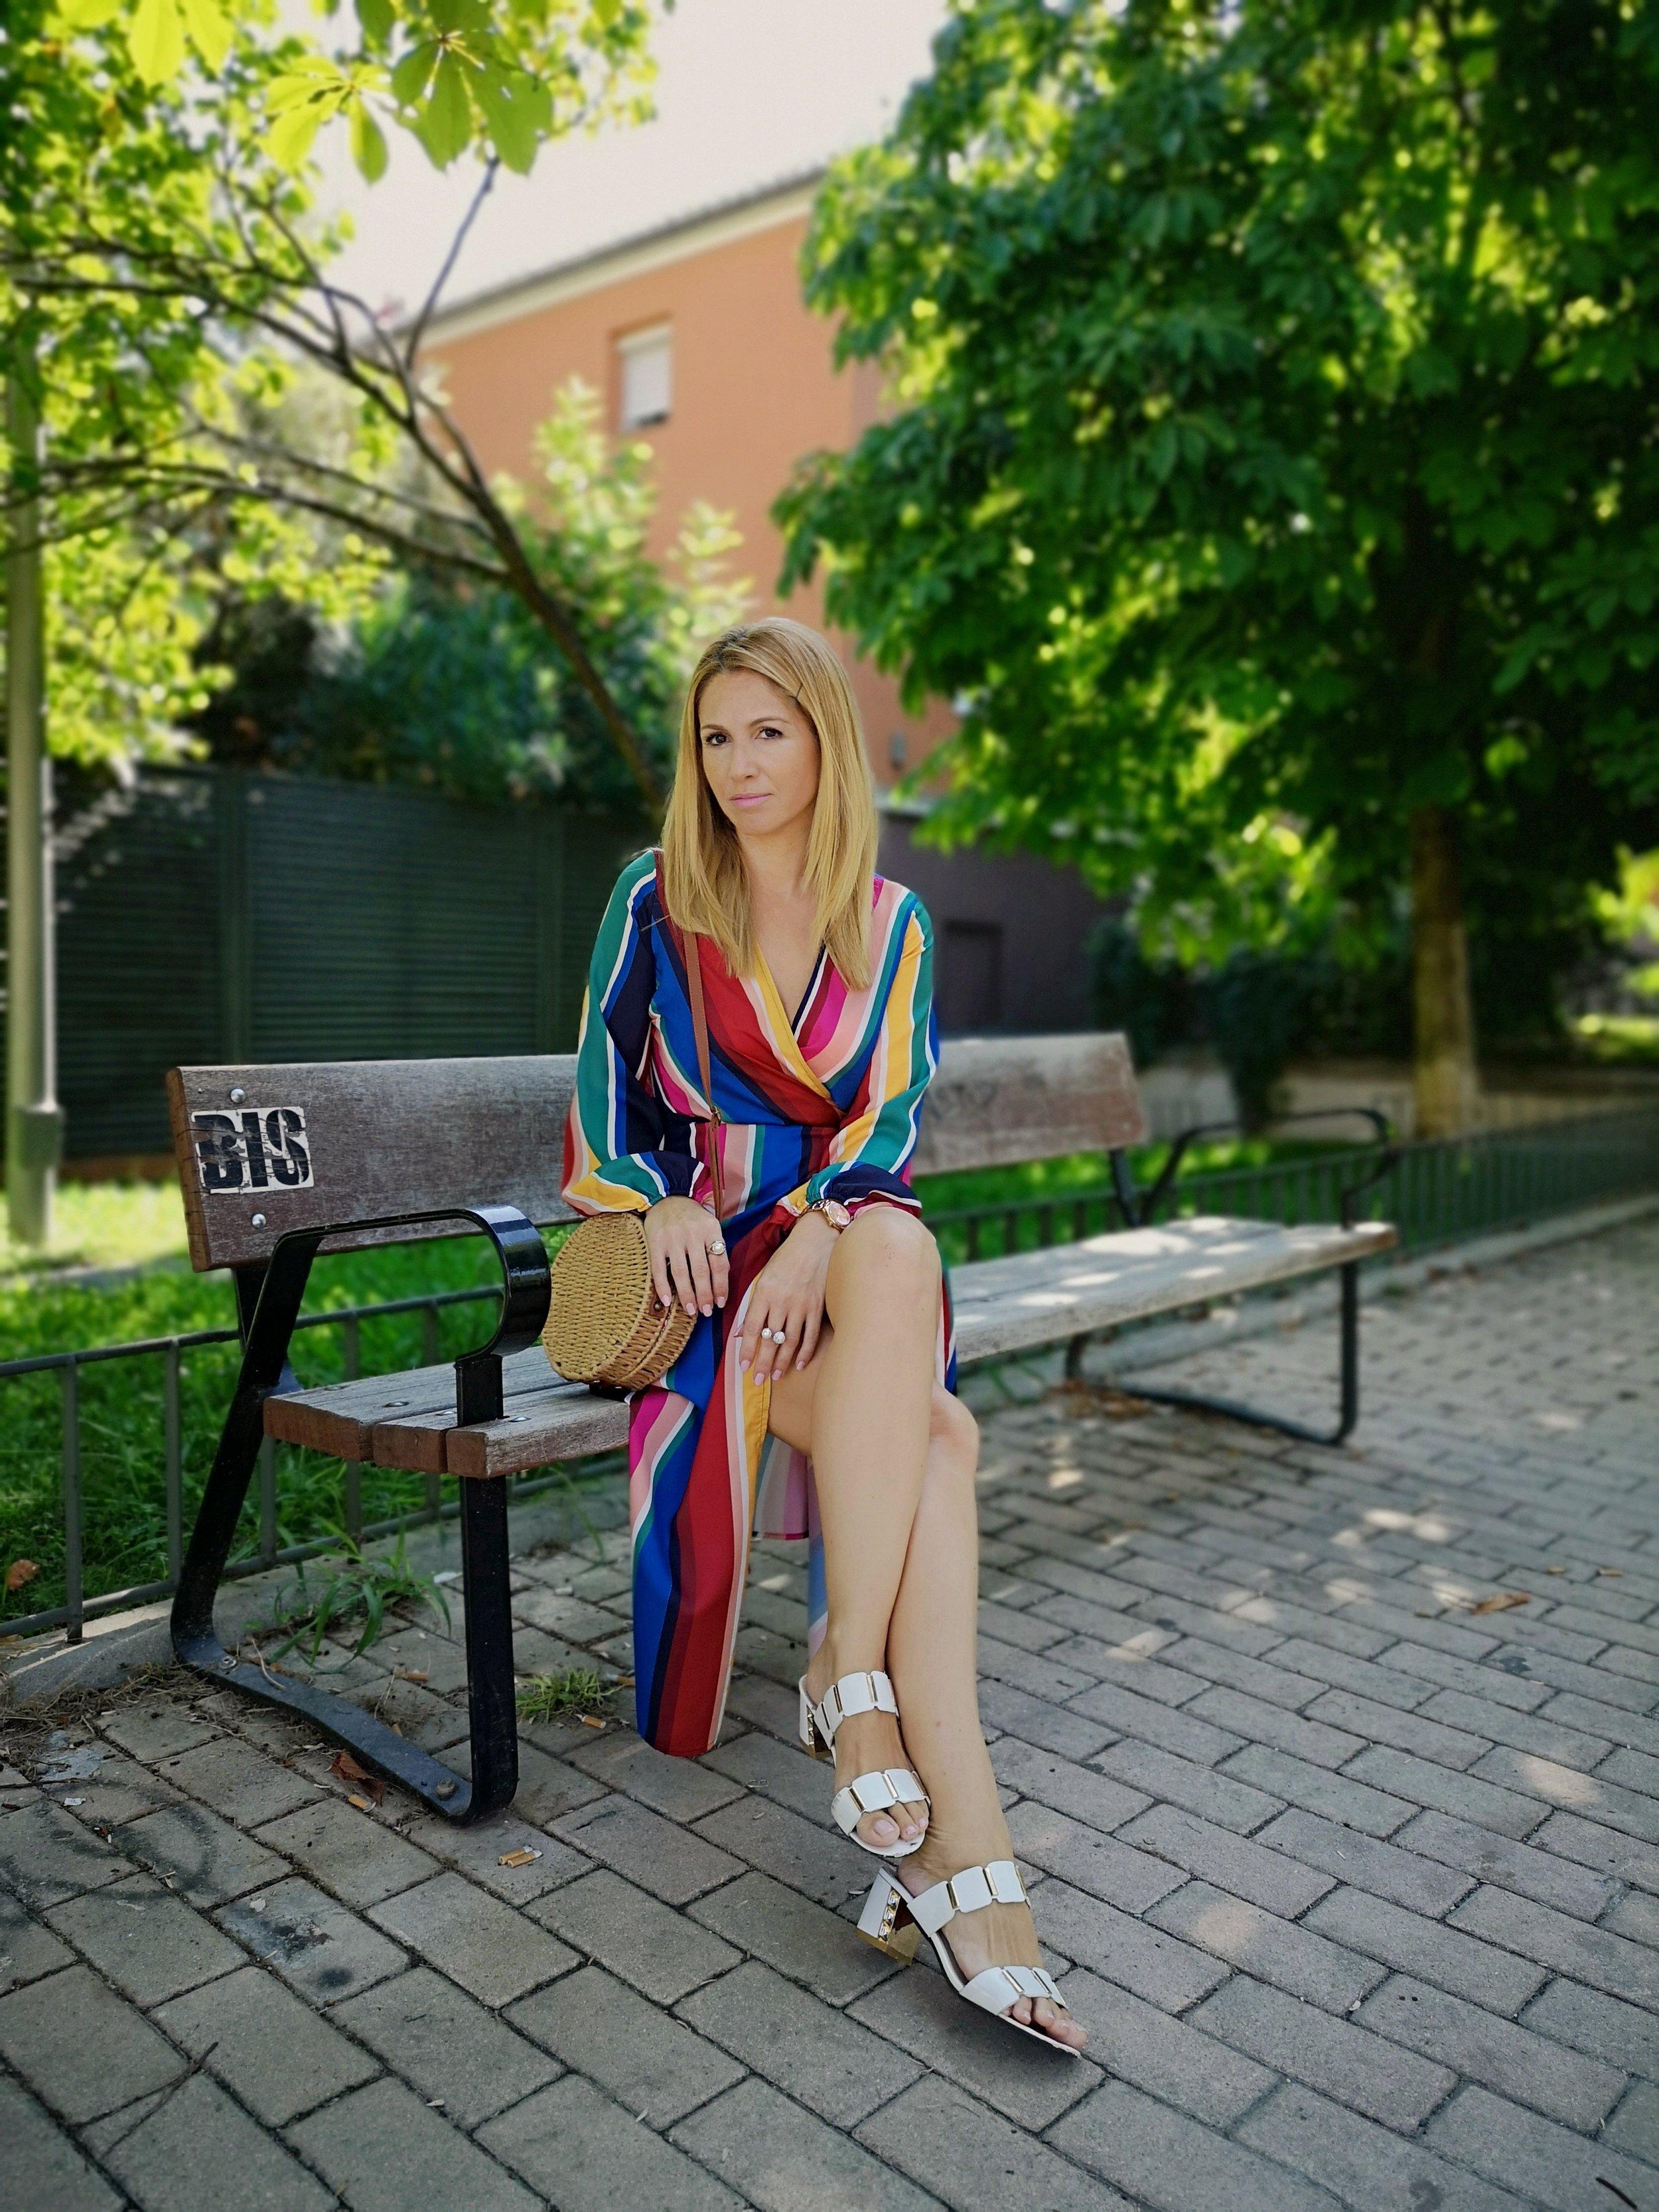 OUTFIT DETAILS: Dress: PRIMARK; Sandals: DRESSLILY; Bag: ZAFUL; Sunnies: ZARA; Ring: ZAFUL;